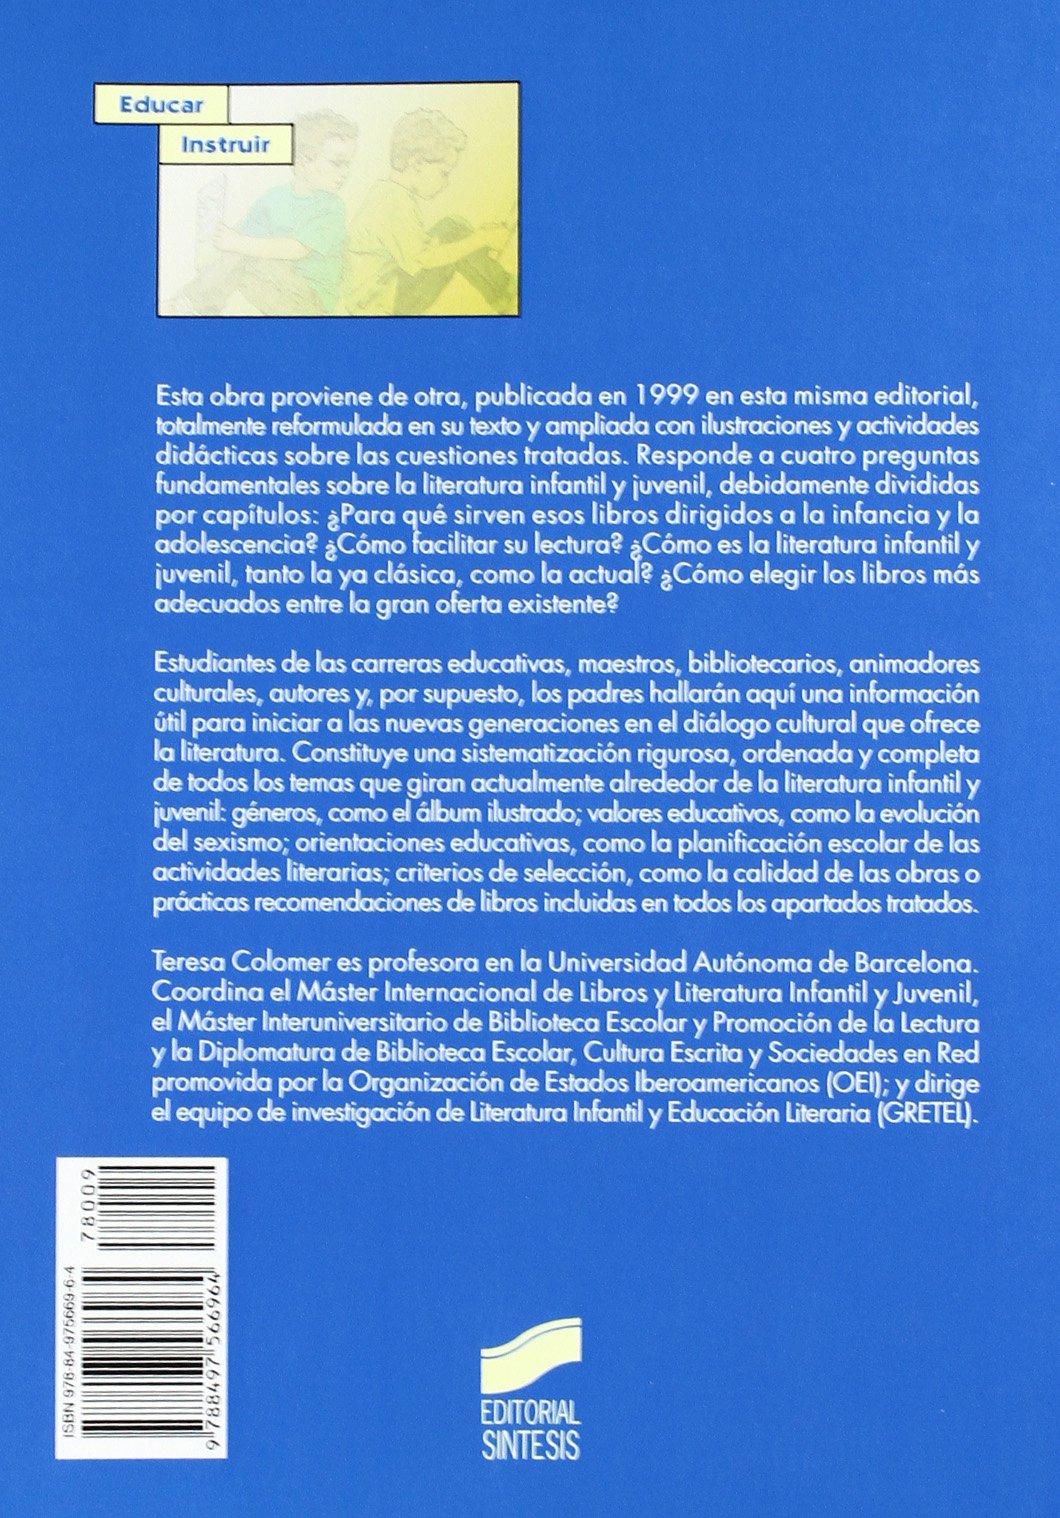 Introducción a la literatura infantil y juvenil actual: Teresa Colomer Martínez: 9788497566964: Amazon.com: Books